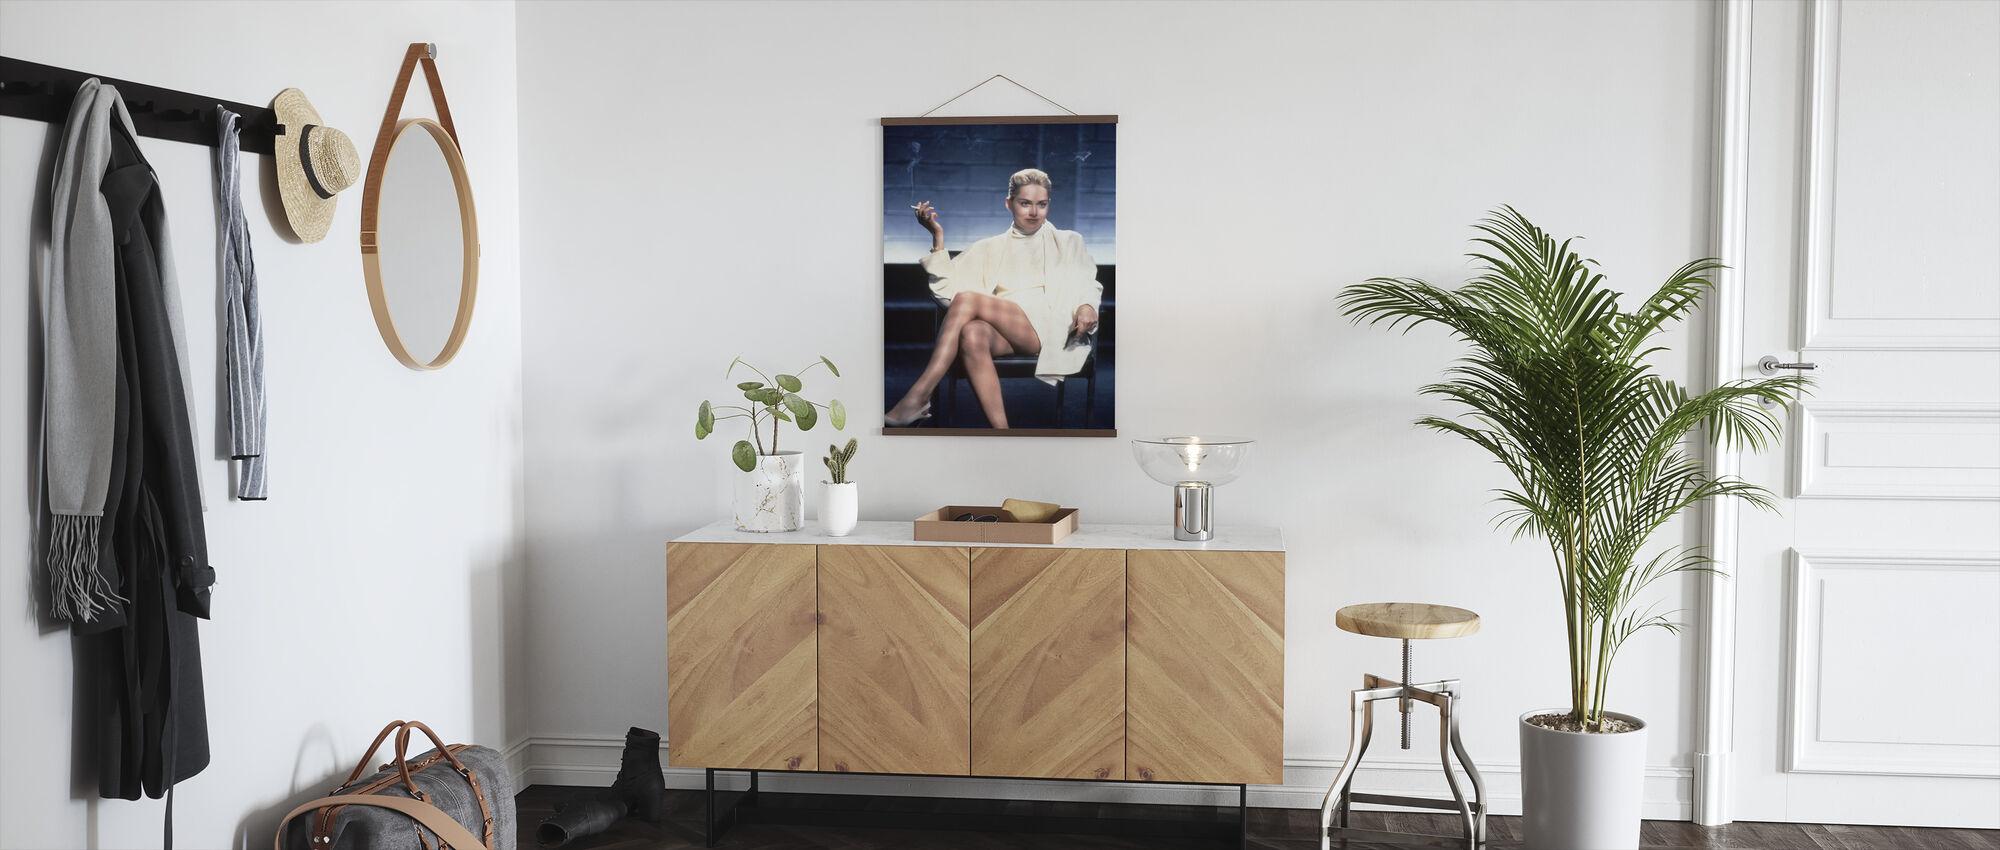 Basic Instinct - Sharon Stone - Poster - Hallway